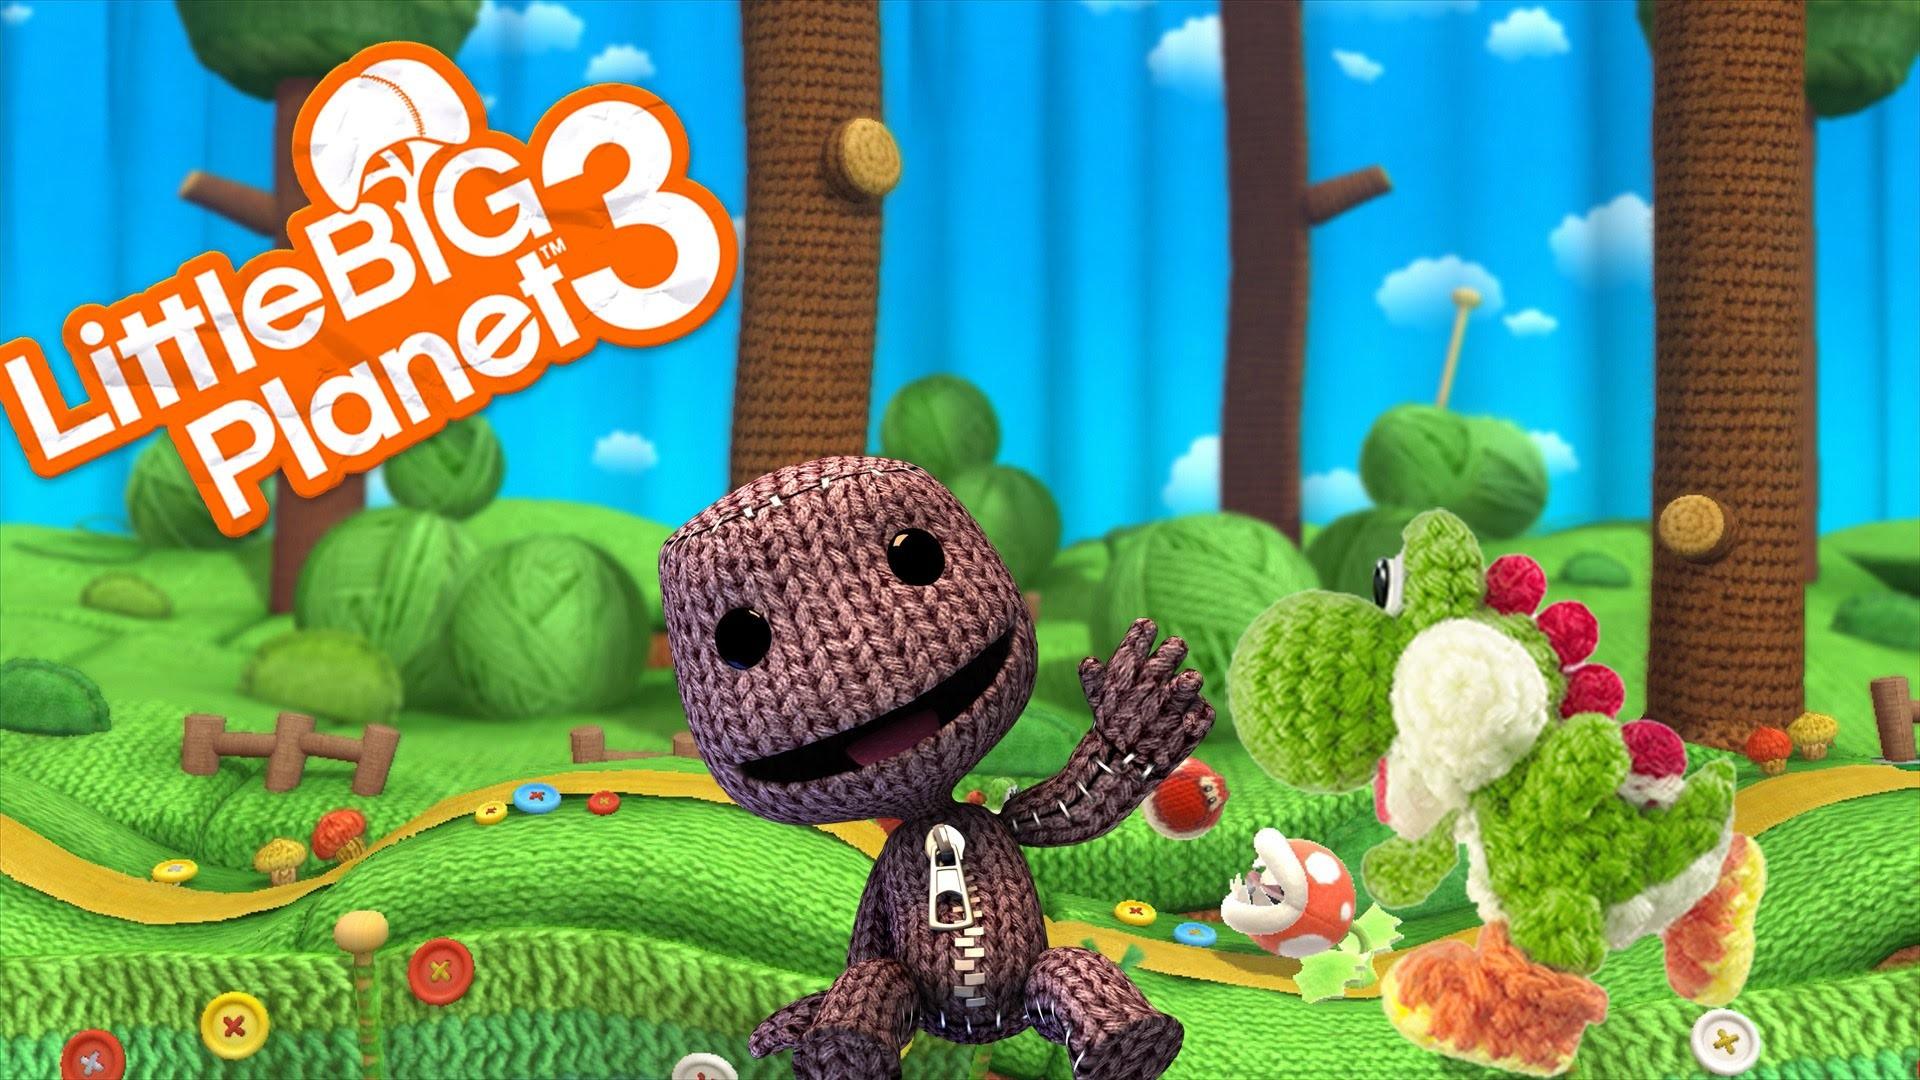 LittleBigPlanet 3~Sackboy's Woolly World~By:PartyGamer13